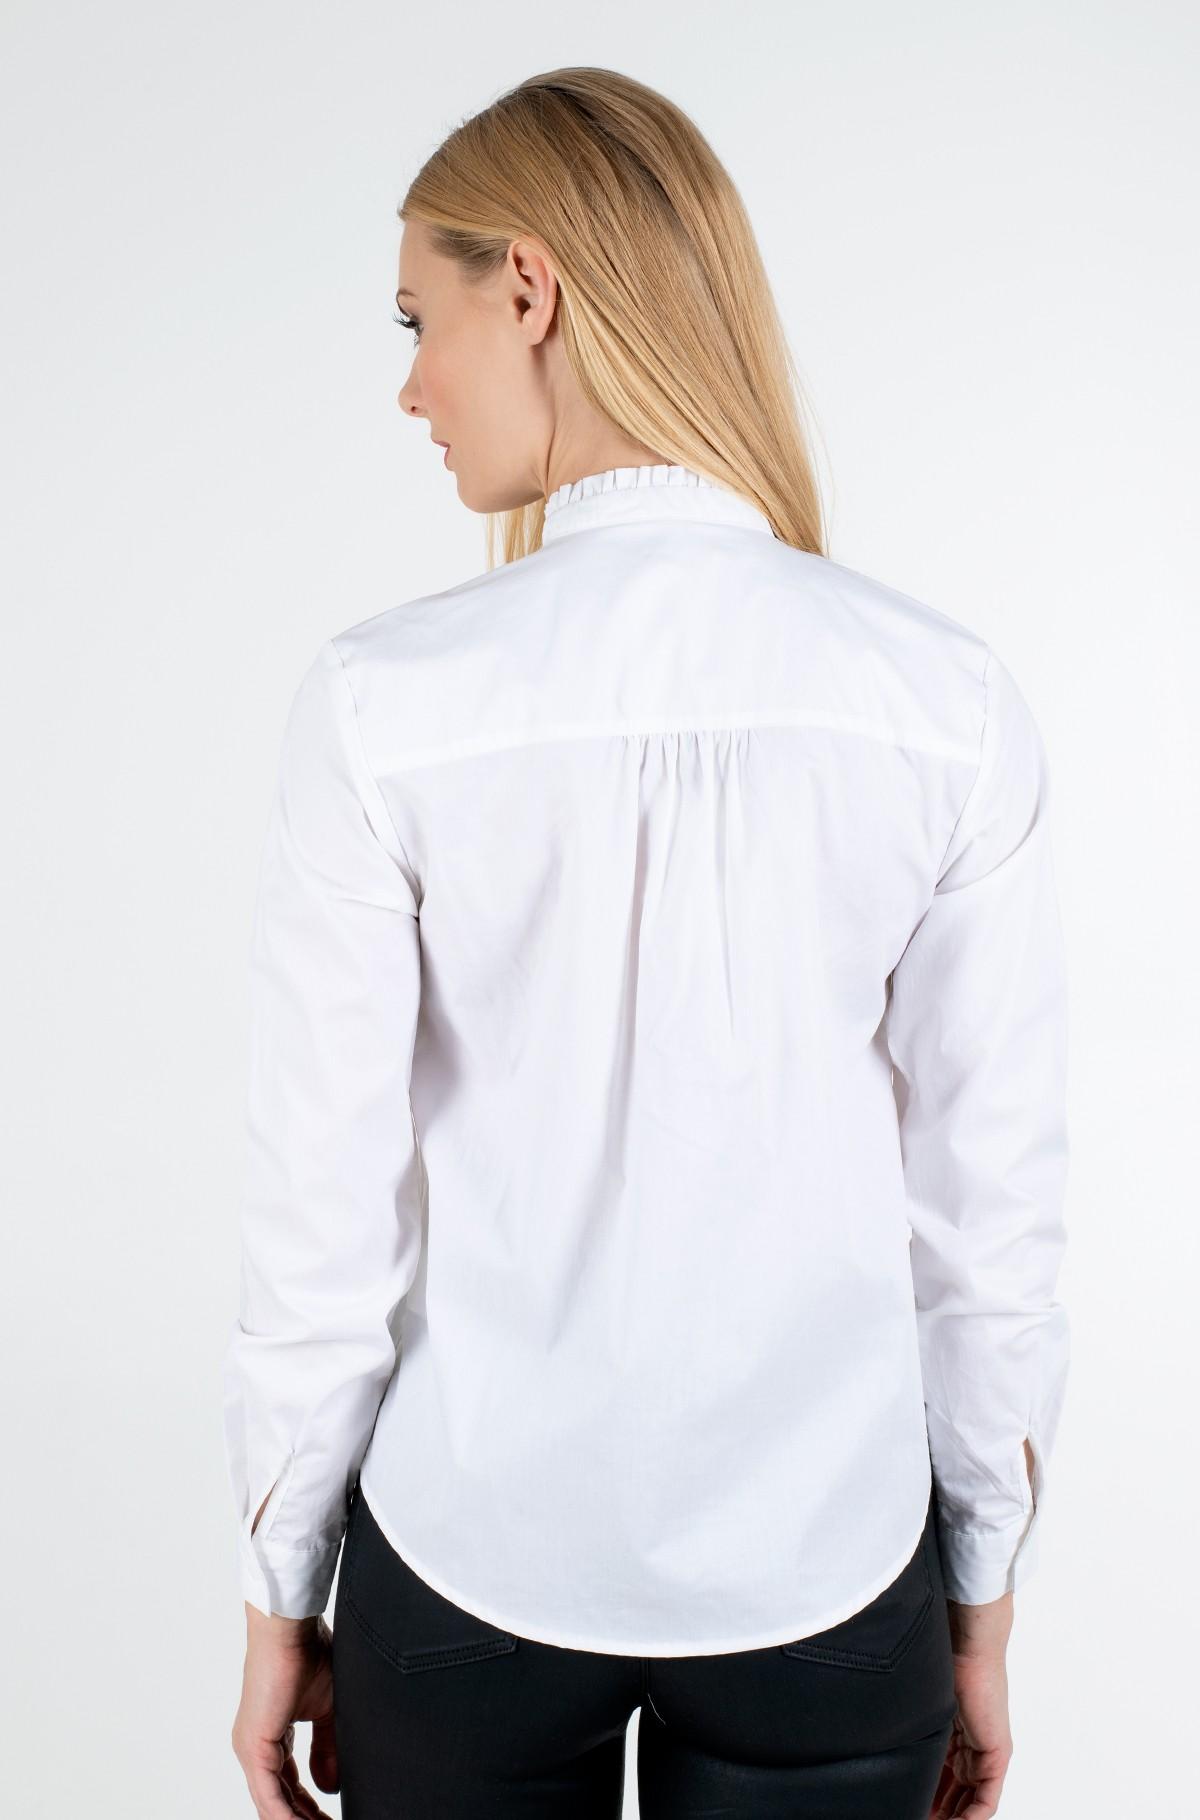 Marškiniai ZABILA/PL303844-full-2